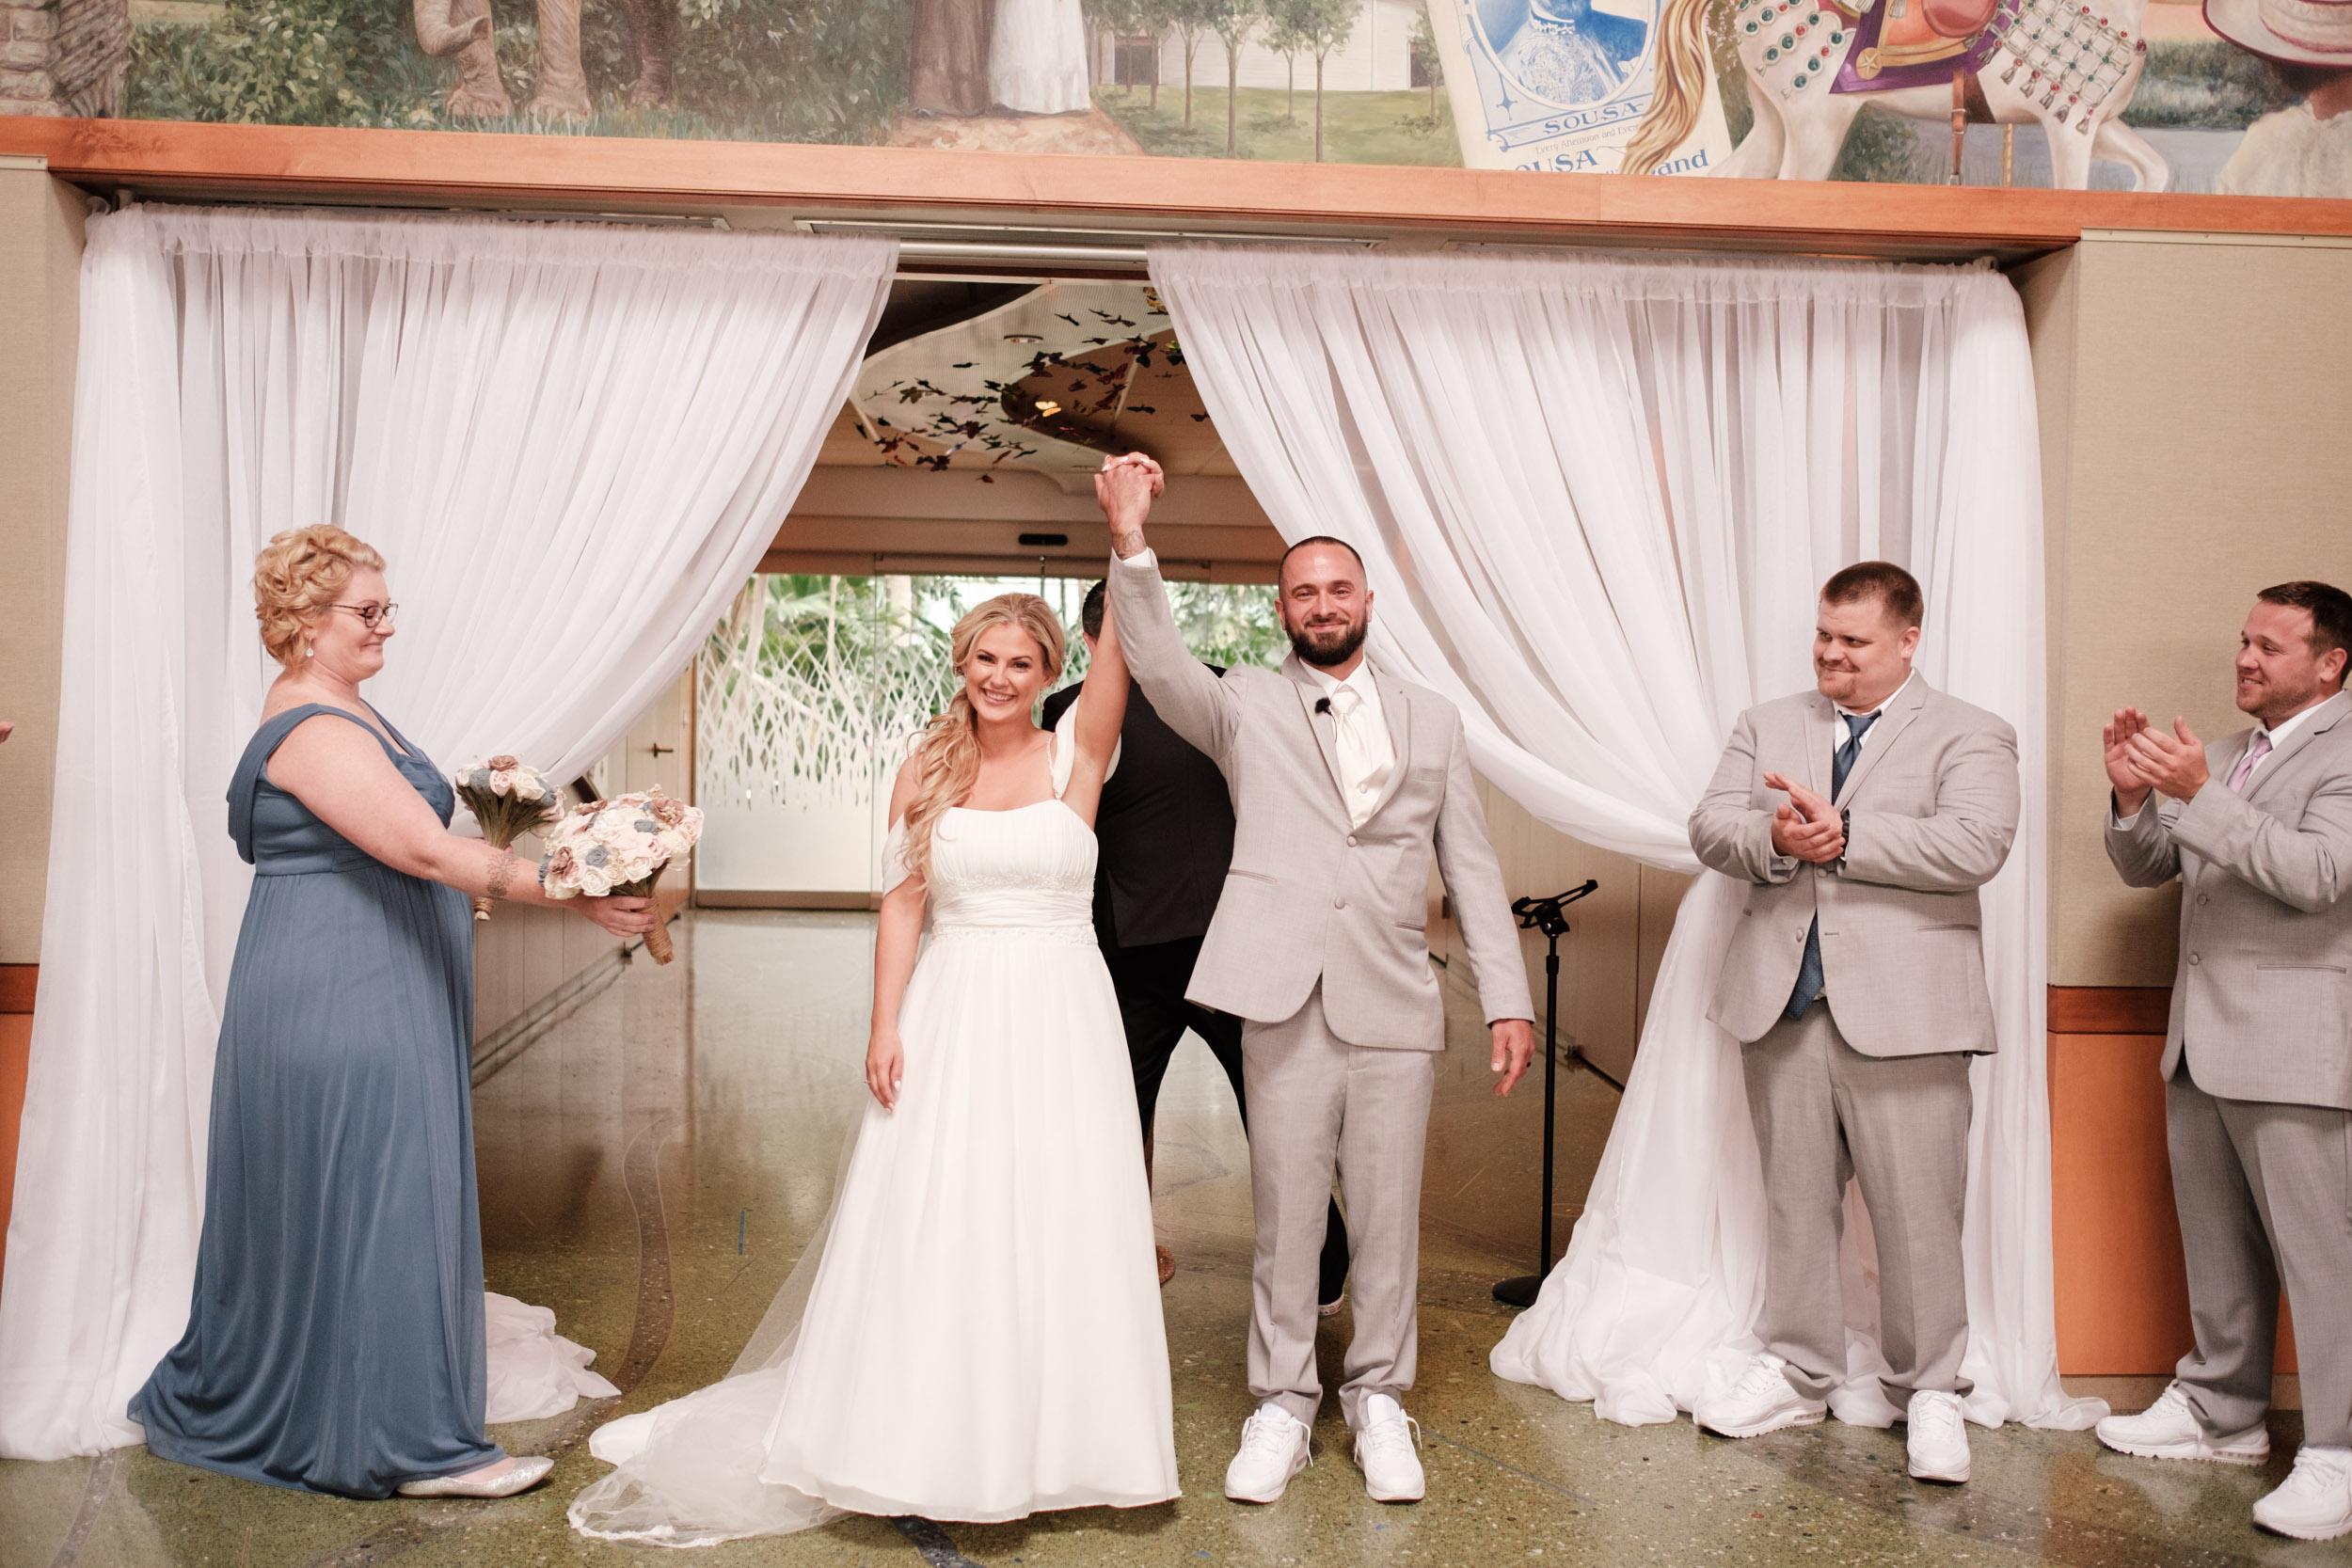 19-06-01 Megan Josh - Nicholas Conservatory Wedding-23.jpg